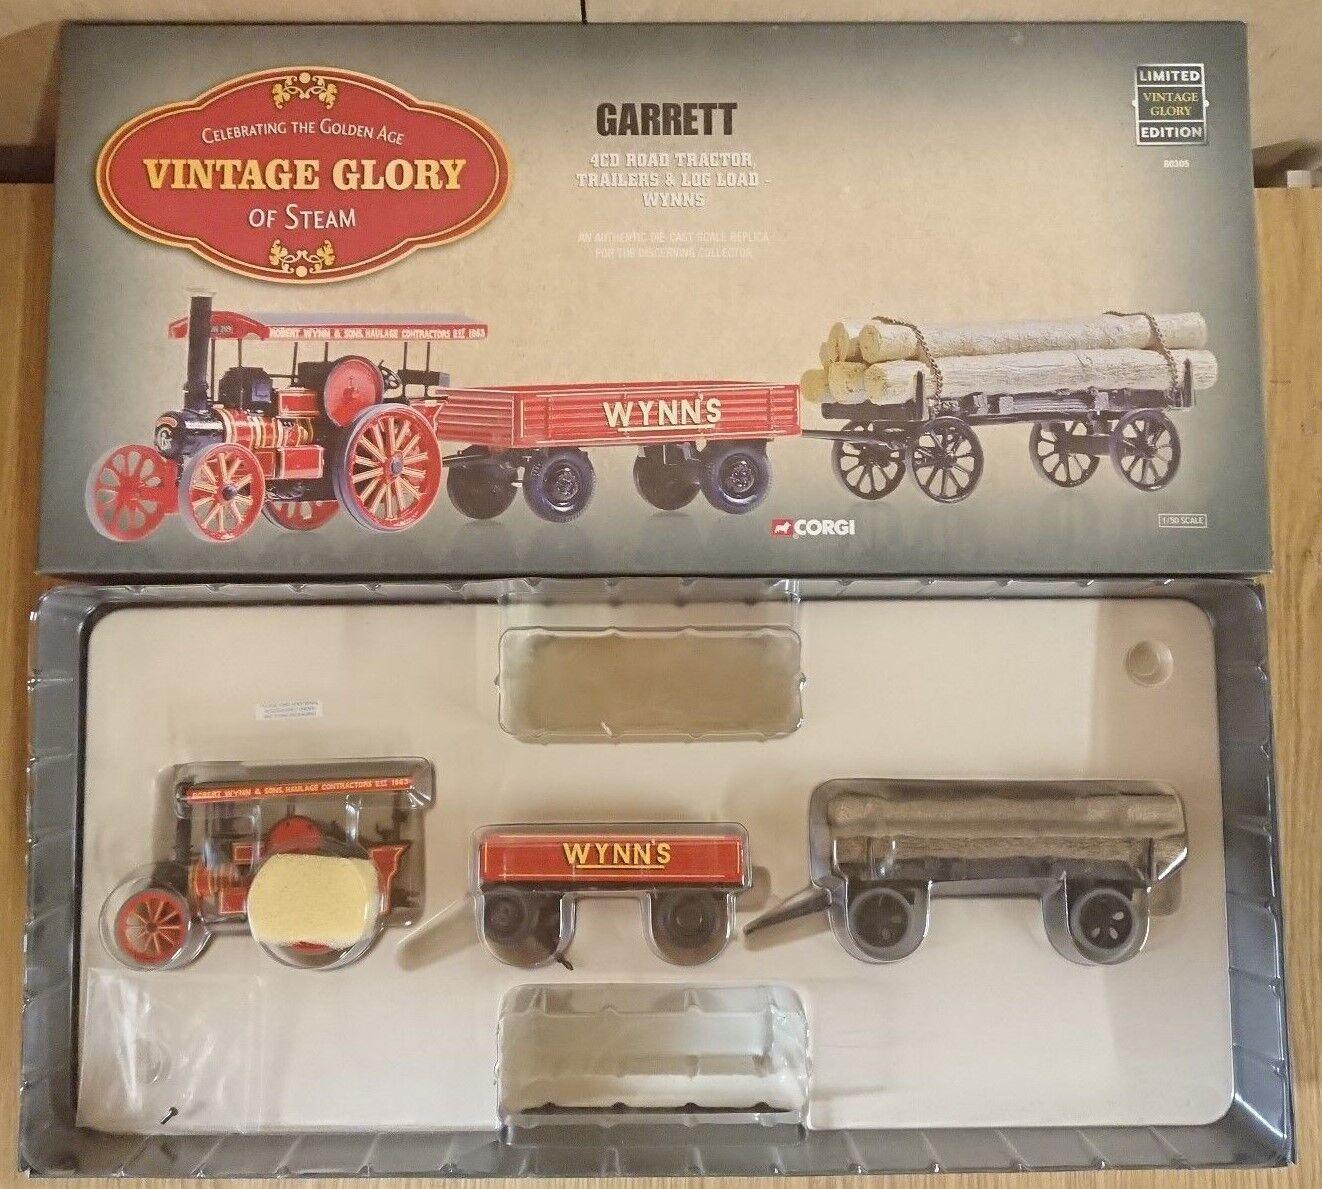 Corgi 80305 Vintage Glory 4CD Rd Tractor Trailers & Log Load Ltd Ed 0005 of 5200